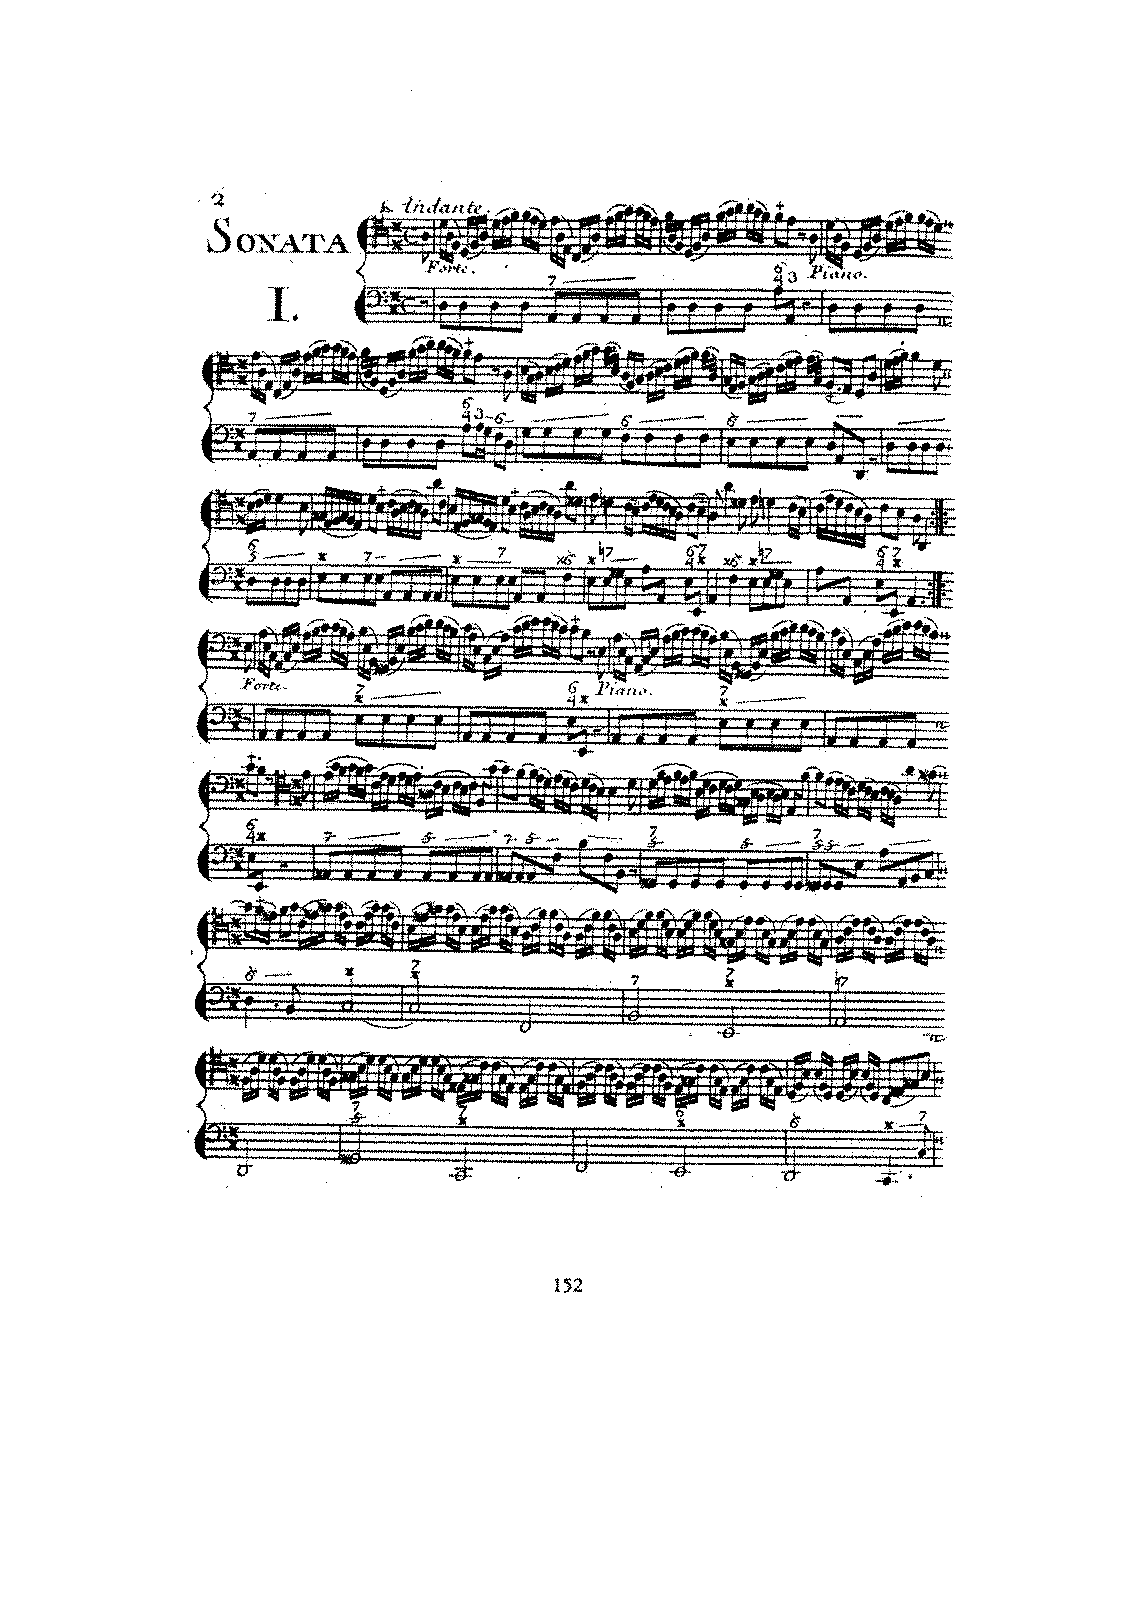 6 Cello Sonatas Livre 4 Barrire JeanBaptiste  IMSLP Free Sheet Music PDF Download